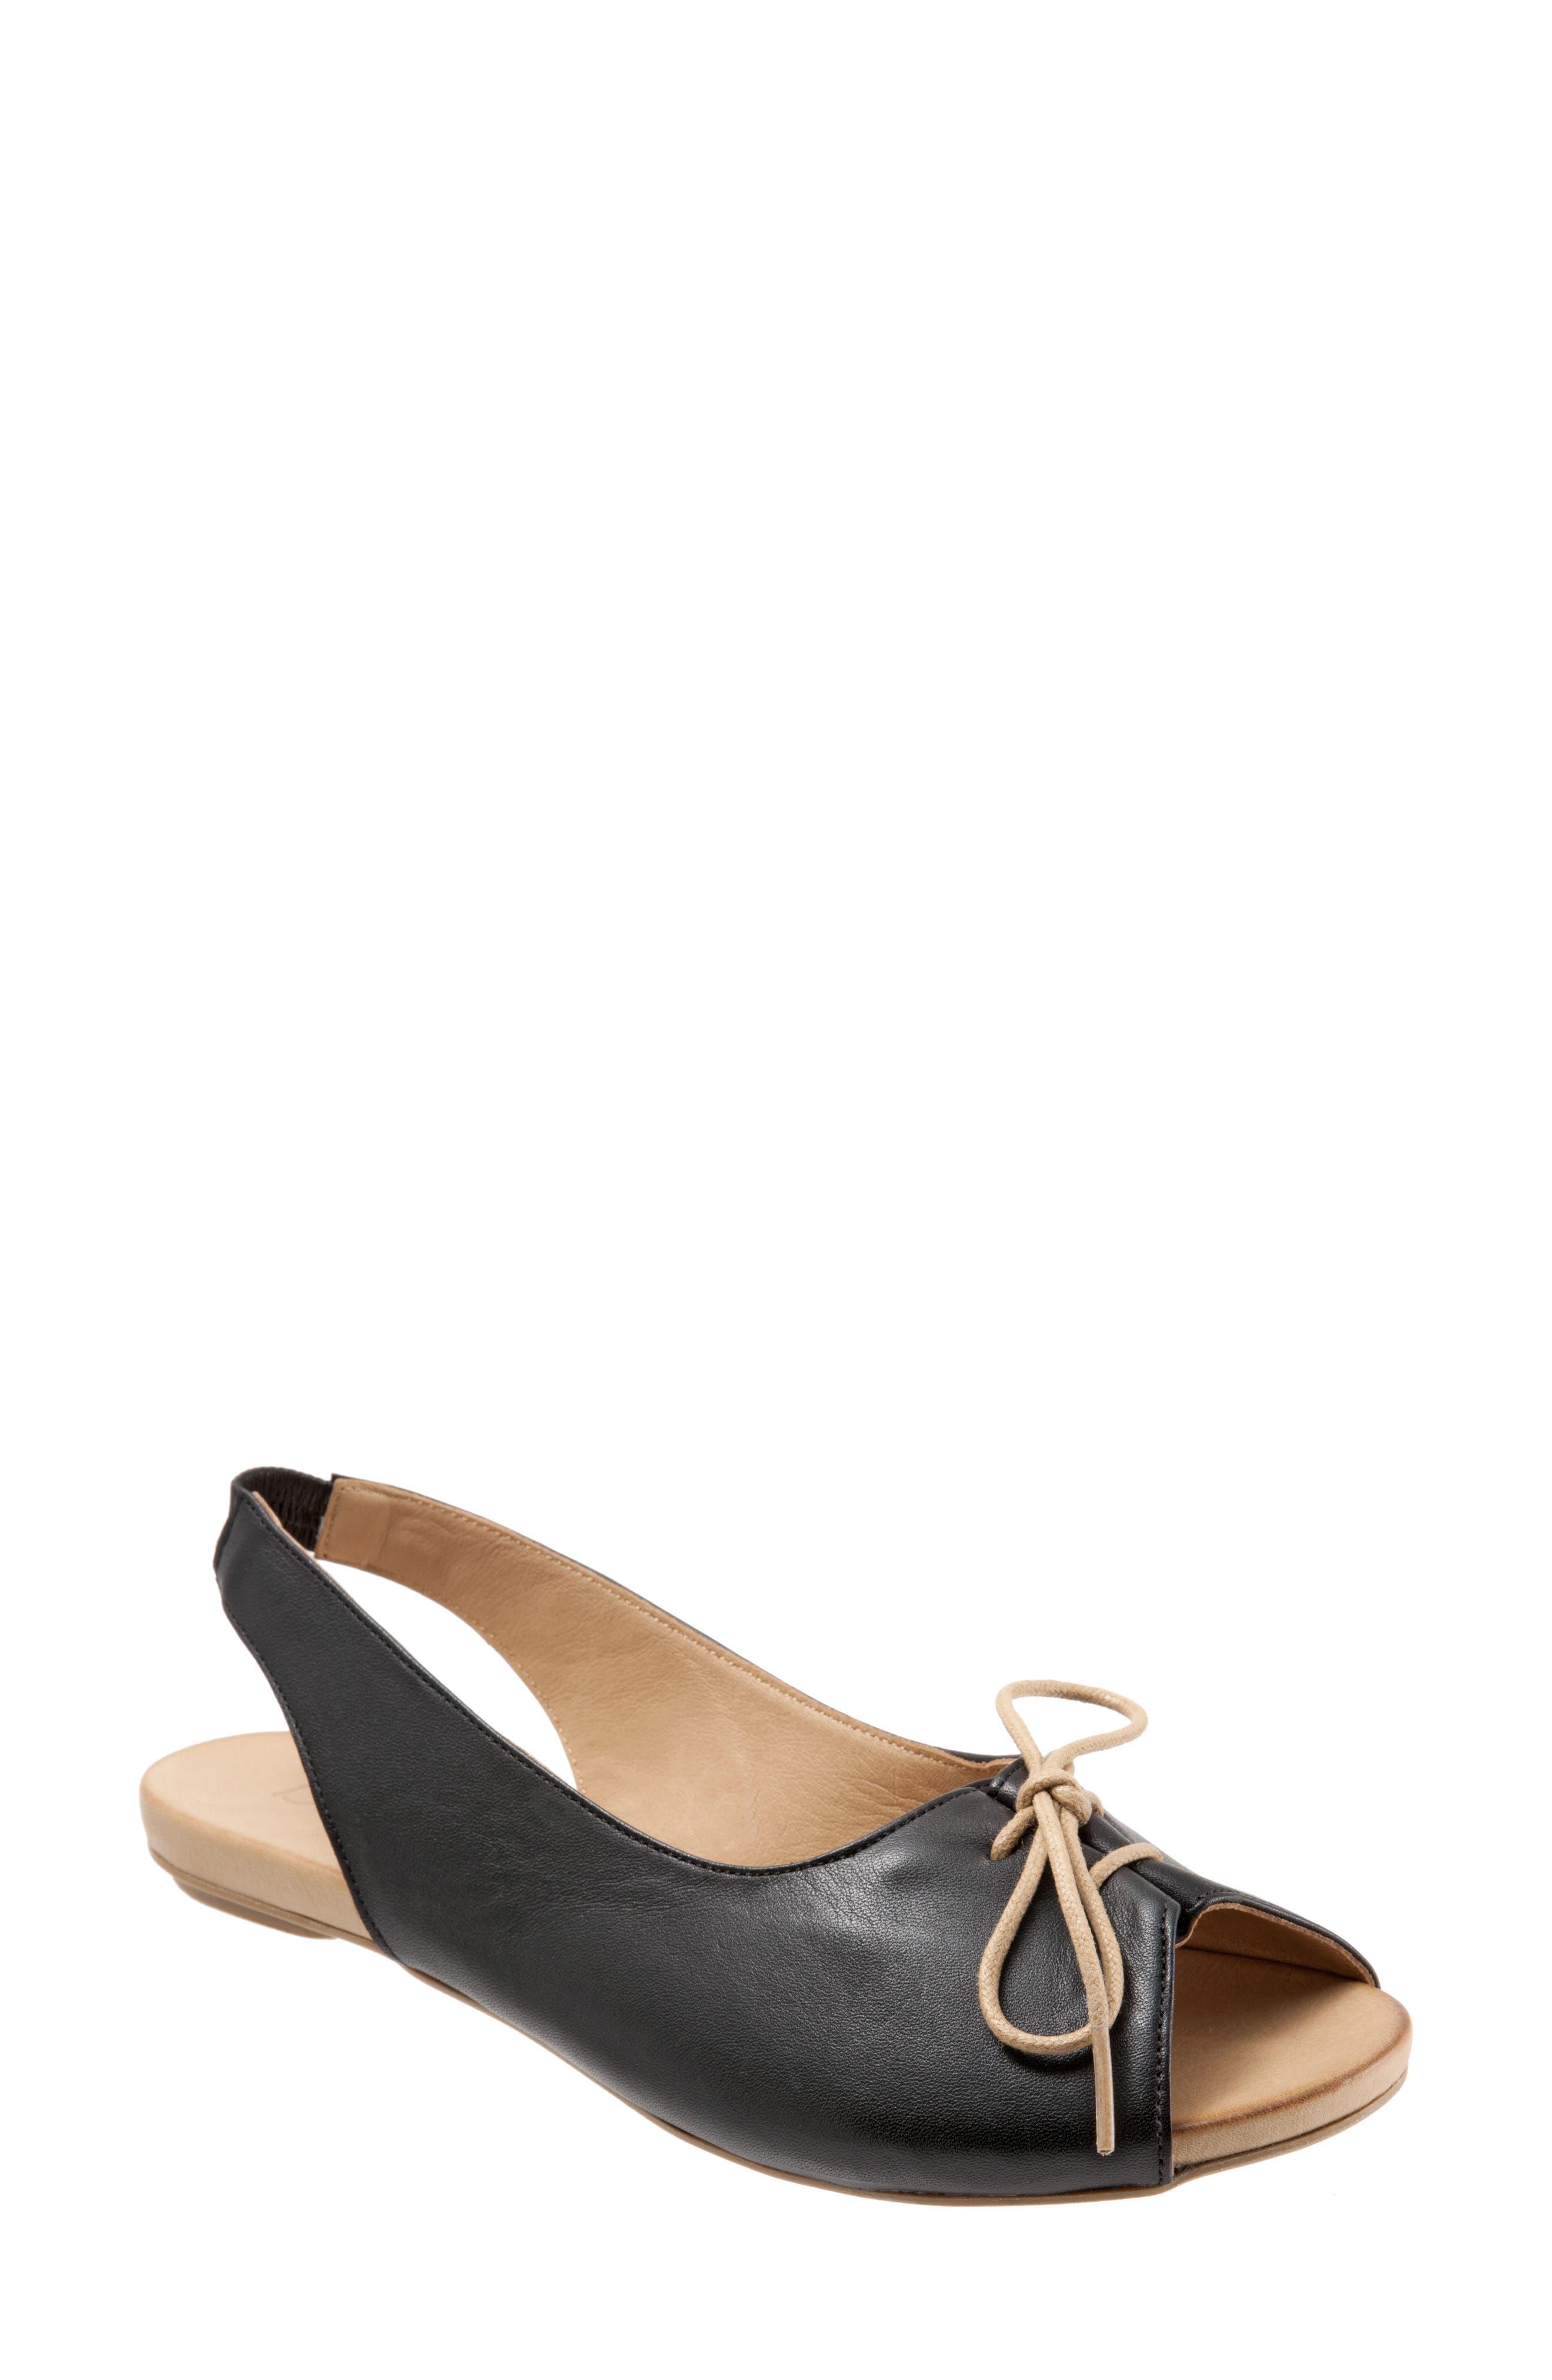 Keely Slingback Tie Sandal,                             Main thumbnail 1, color,                             BLACK LEATHER